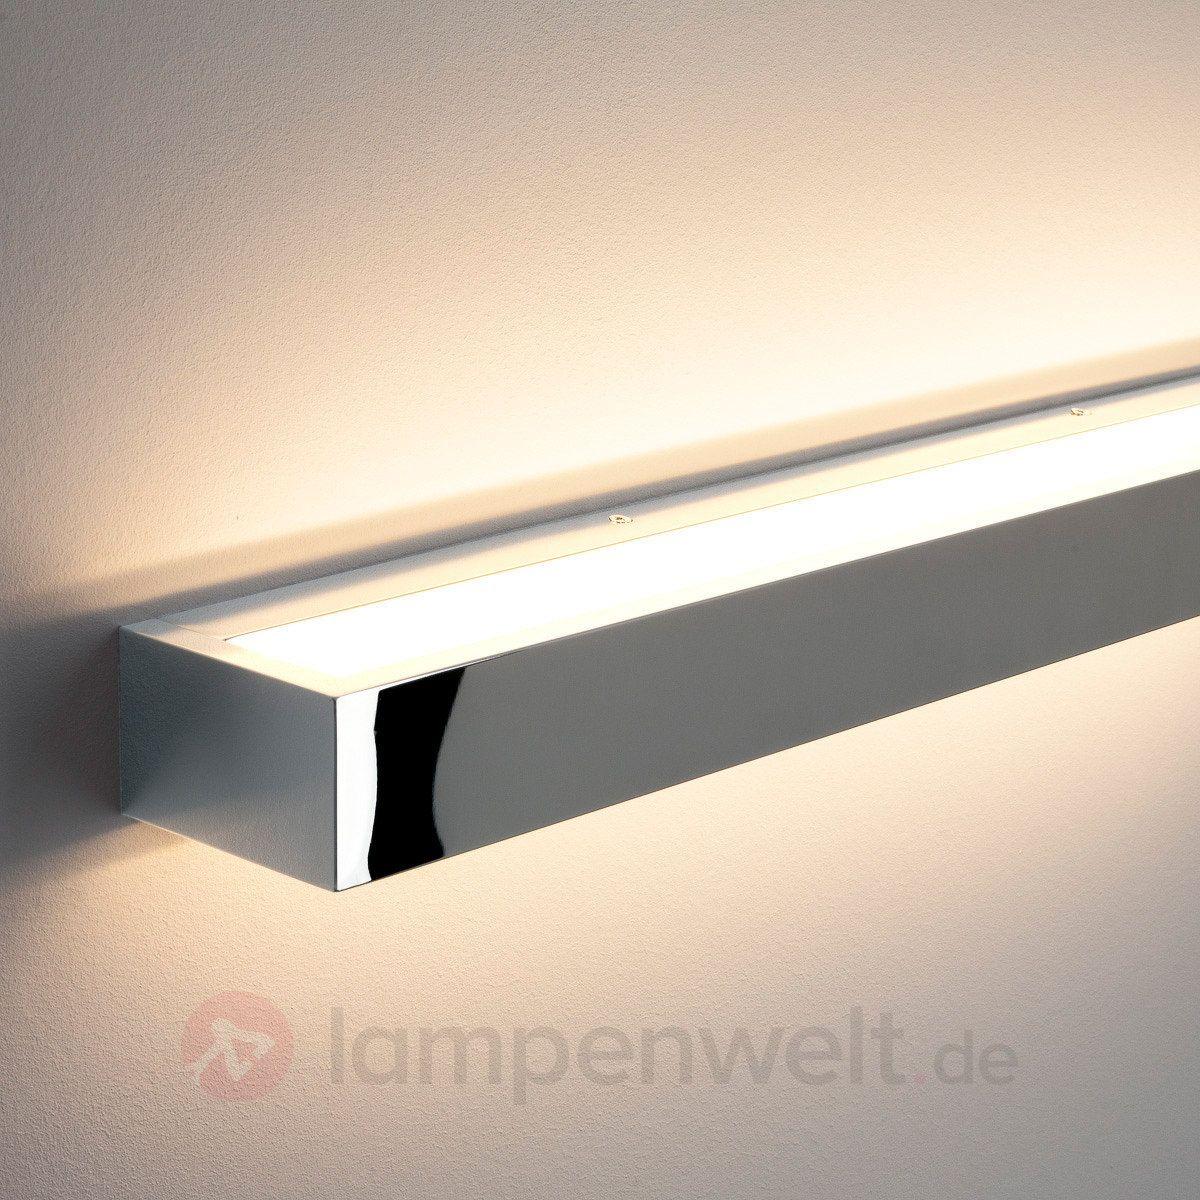 Lange LED-Wandleuchte Cilian, chrom 9633008